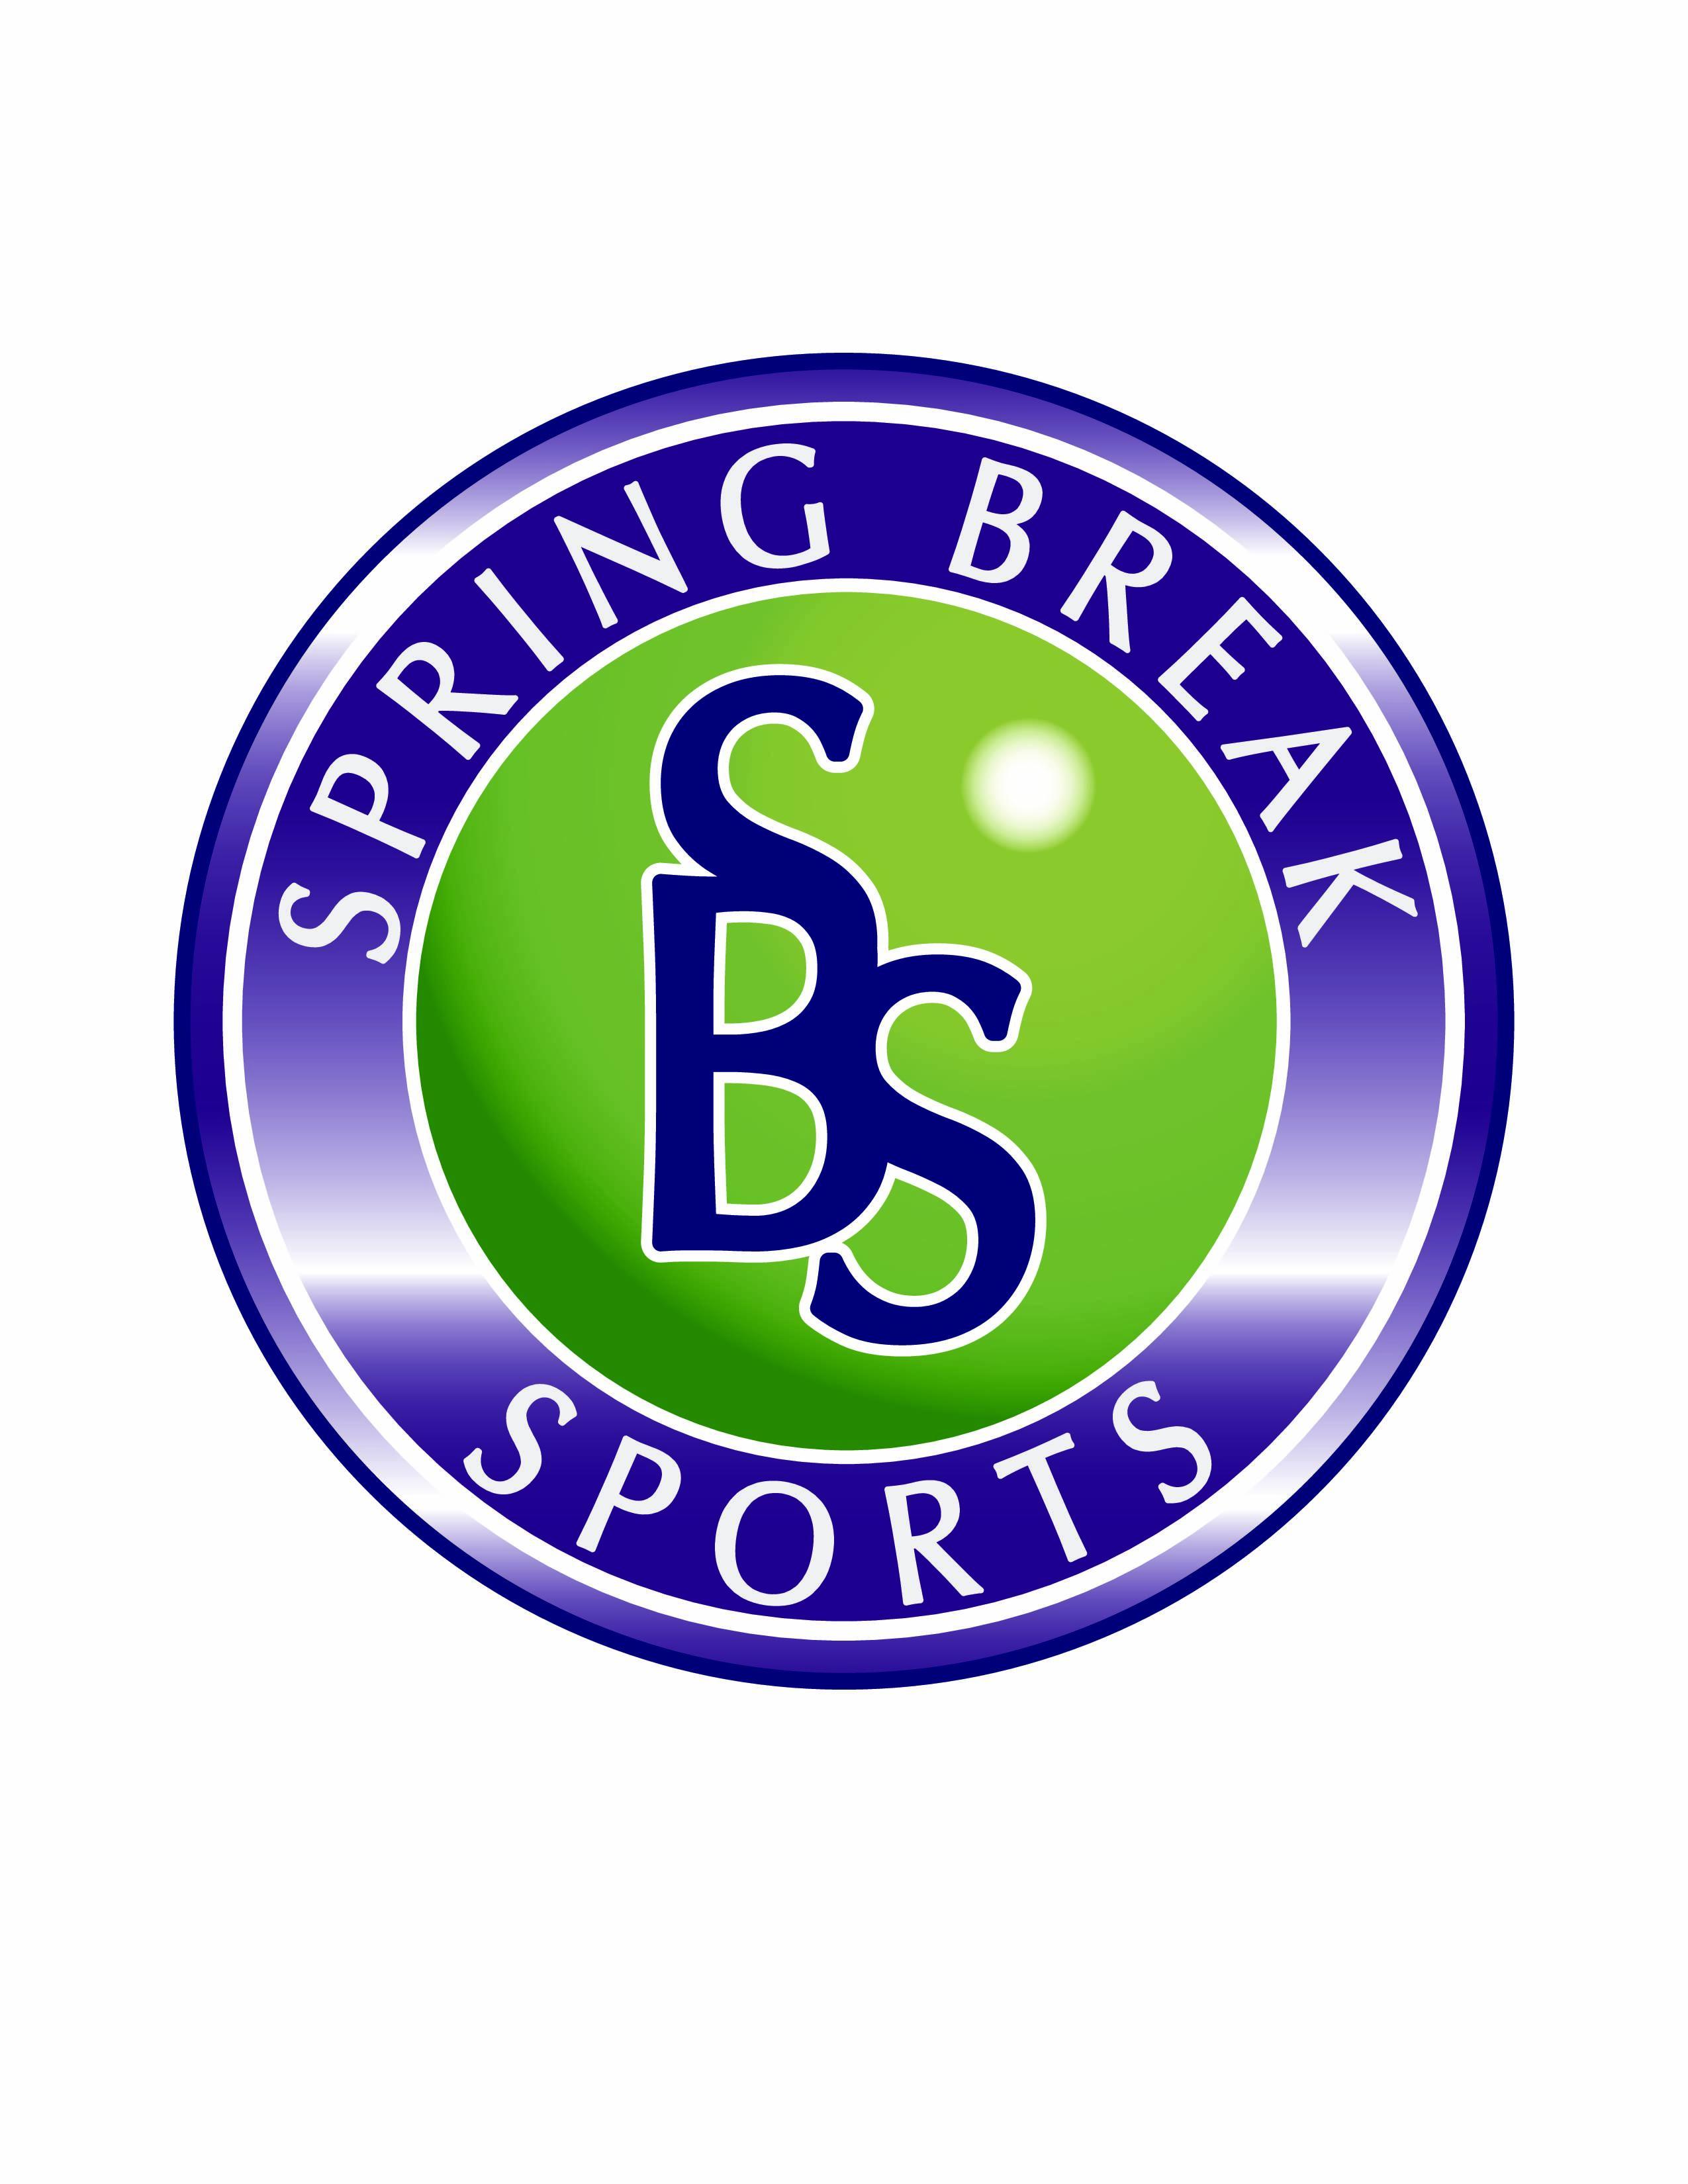 springbreaksports.com